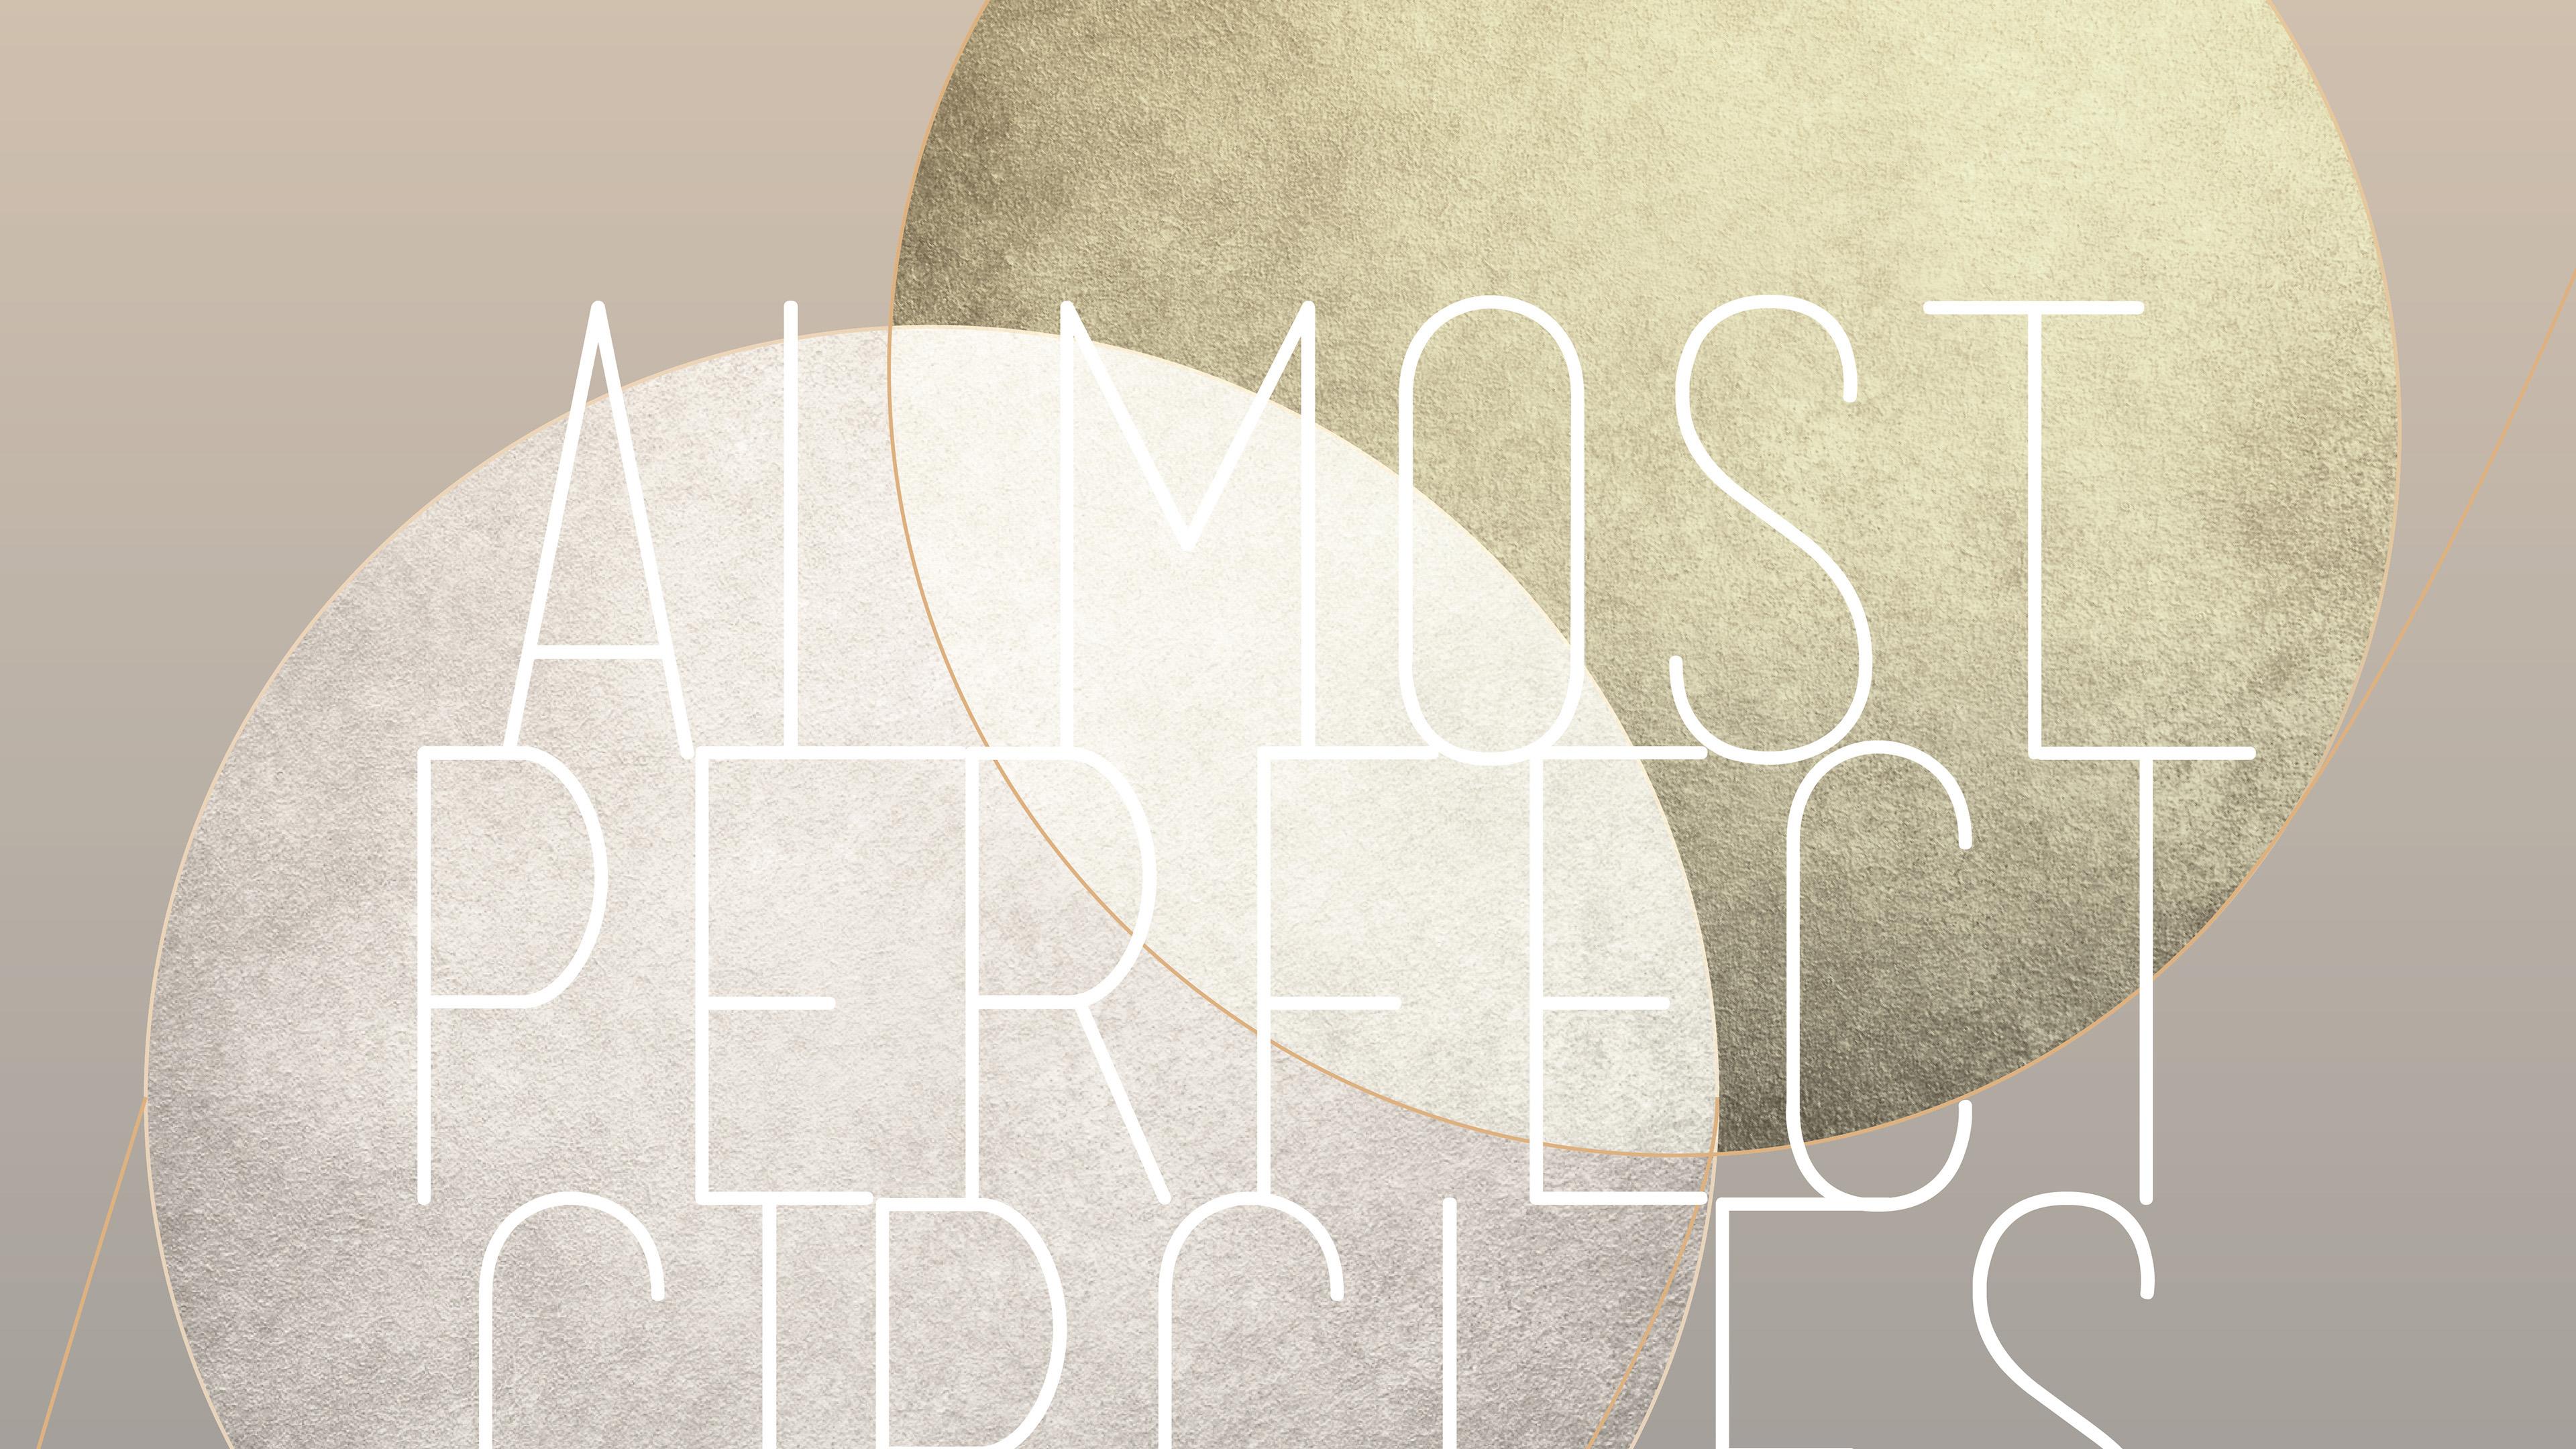 Plakat; Kommunikationsdesign; Grafikdesign; Design; print;